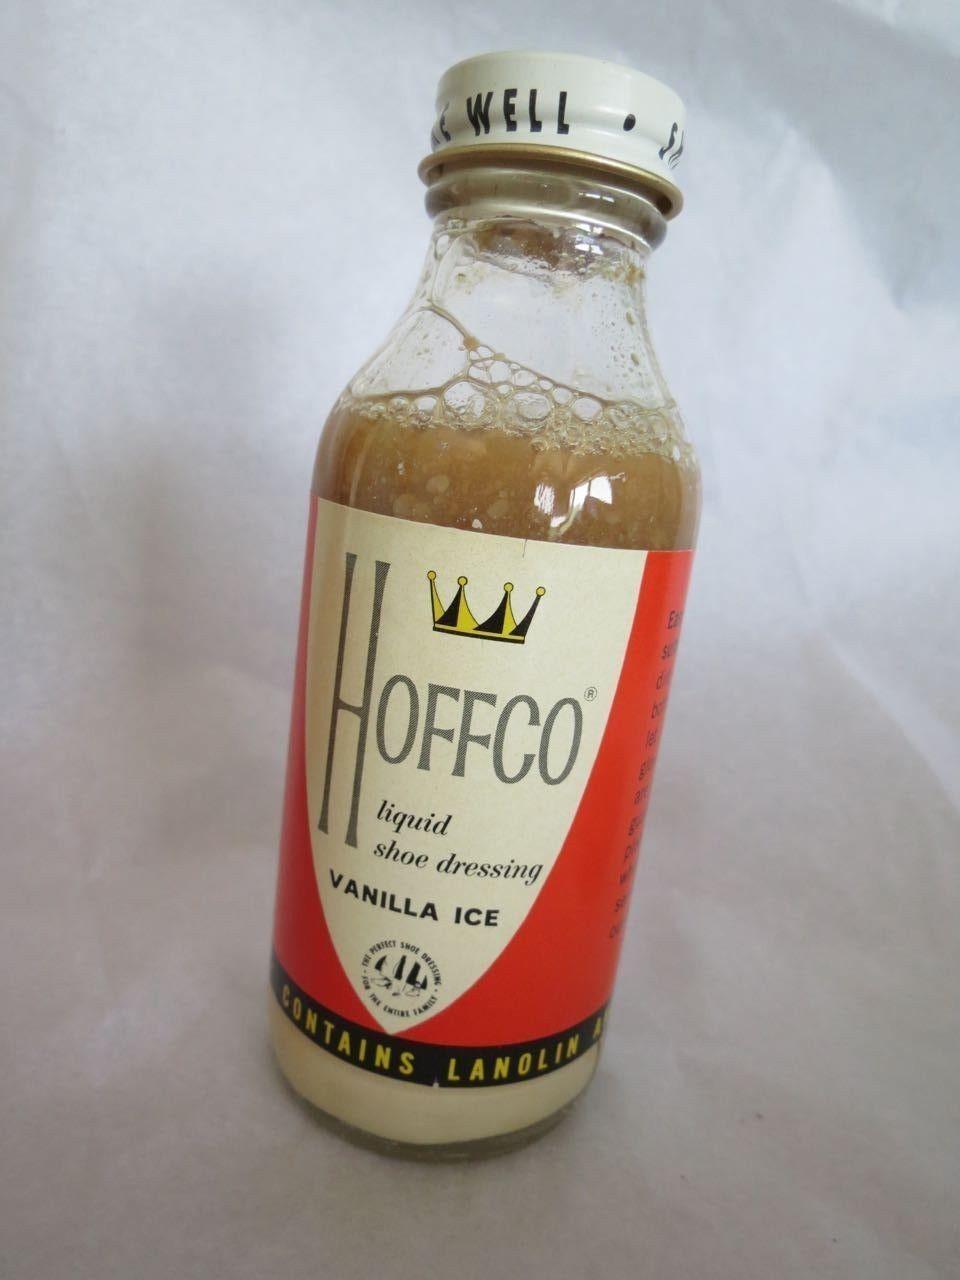 Merchandise & Memorabilia Other Merch & Memorabilia Ads Delicious Vintage Hoffco Liquid Shoe Dressing Vanilla Ice Advertisement Box W/ Bottle Full